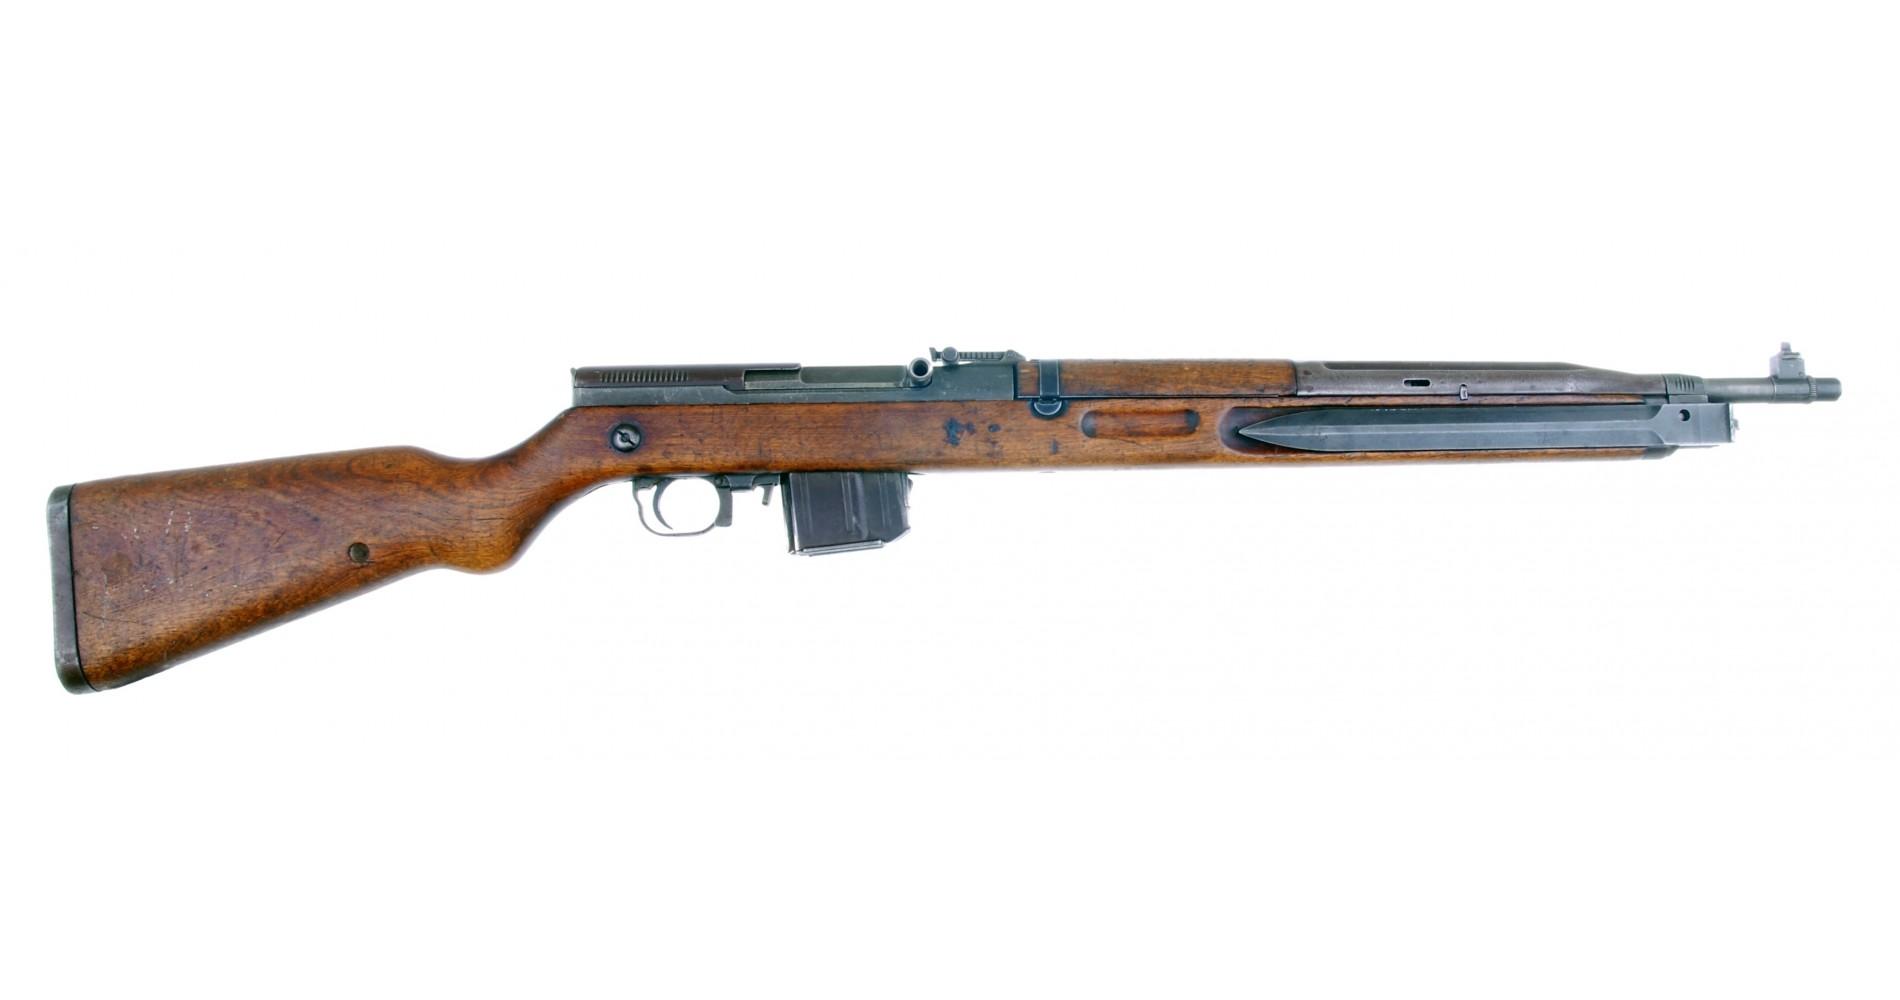 Self-loading Rifles